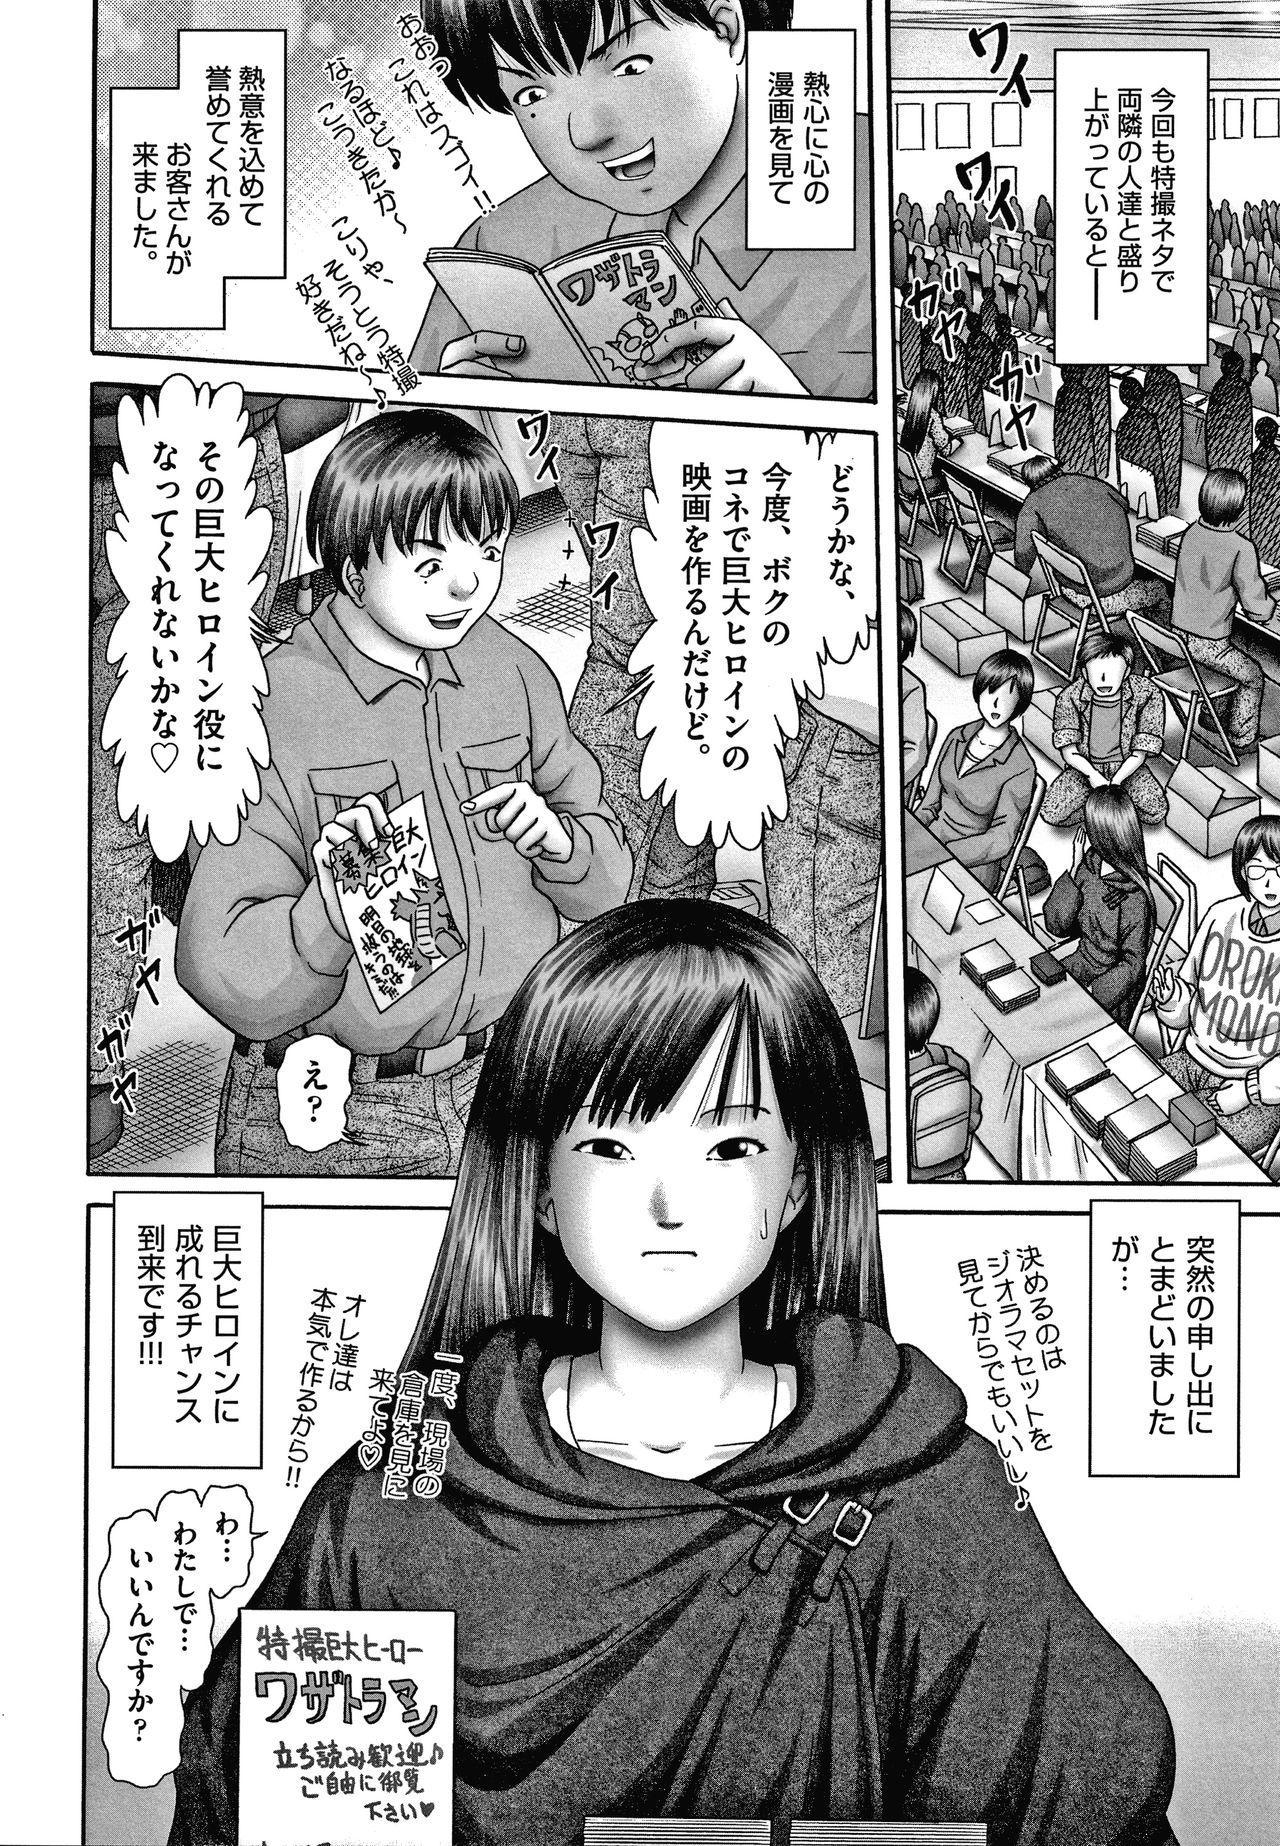 Shoujo Kumikyoku 15 60